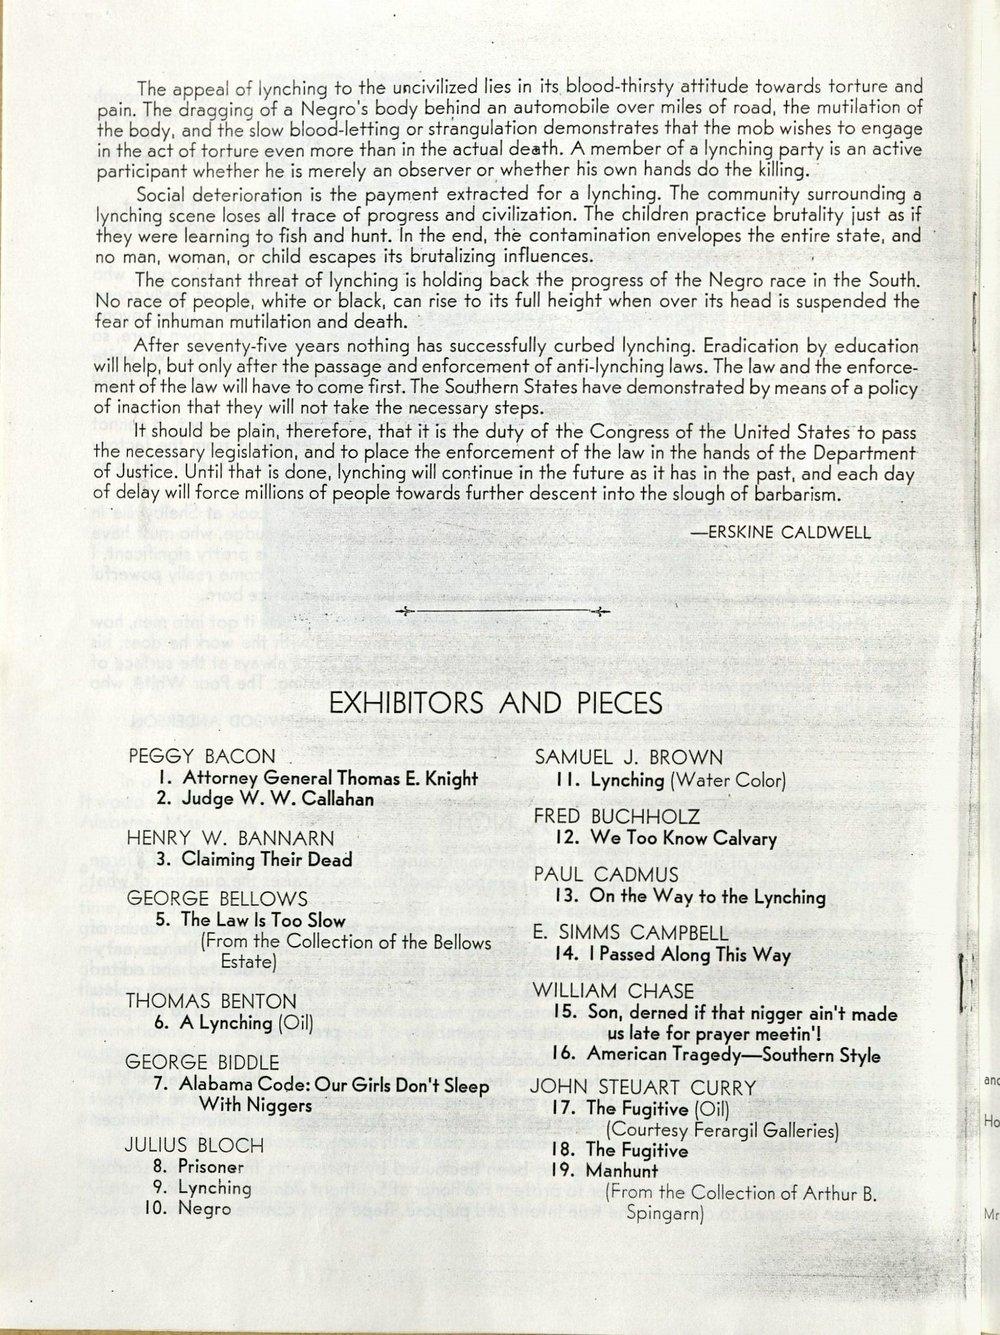 1935LynchingProgram_Page_4.jpg